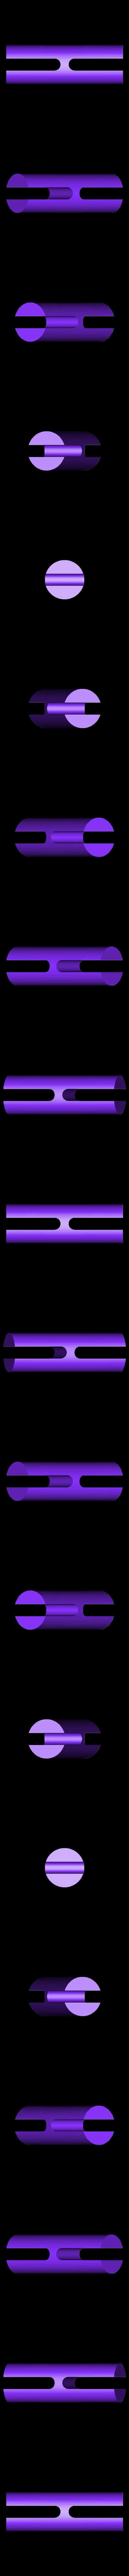 Castle_Pin_1.stl Download free STL file Castle Dedede - Amiibo Prop • 3D printable object, ChrisBobo